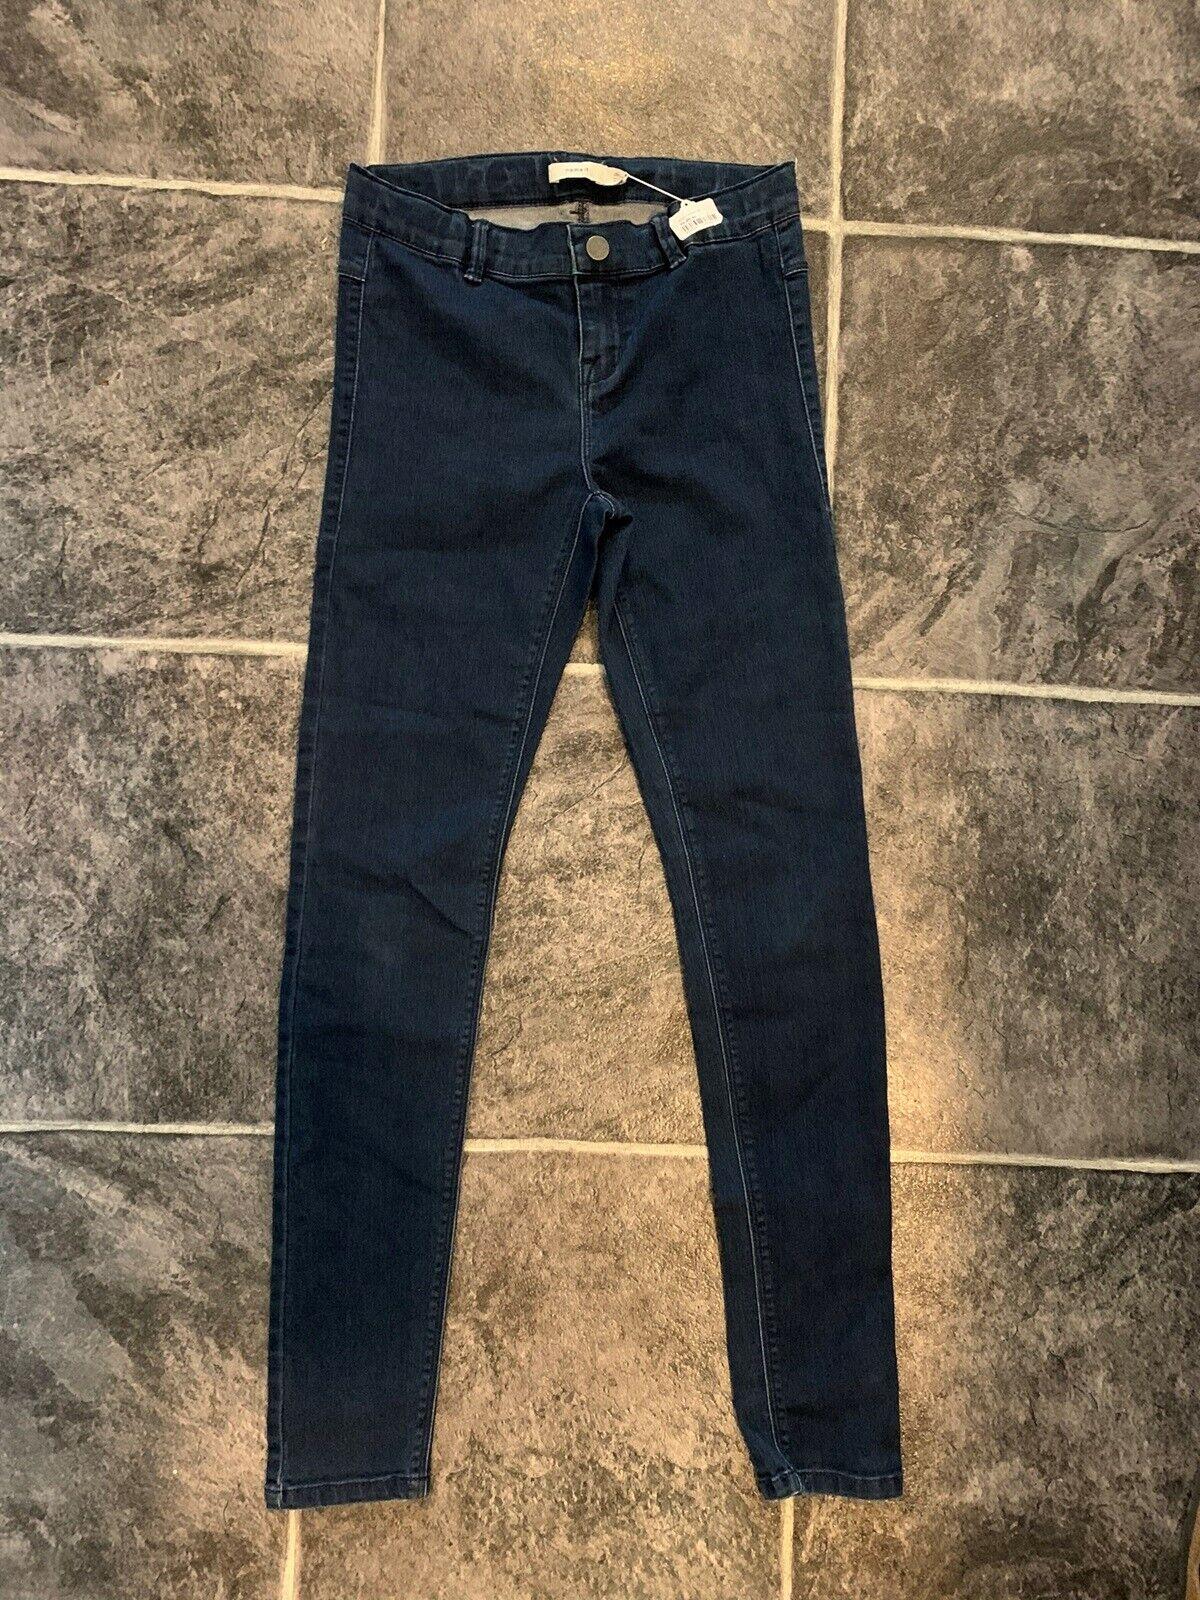 Bukser, Skinny jeans, Nameit